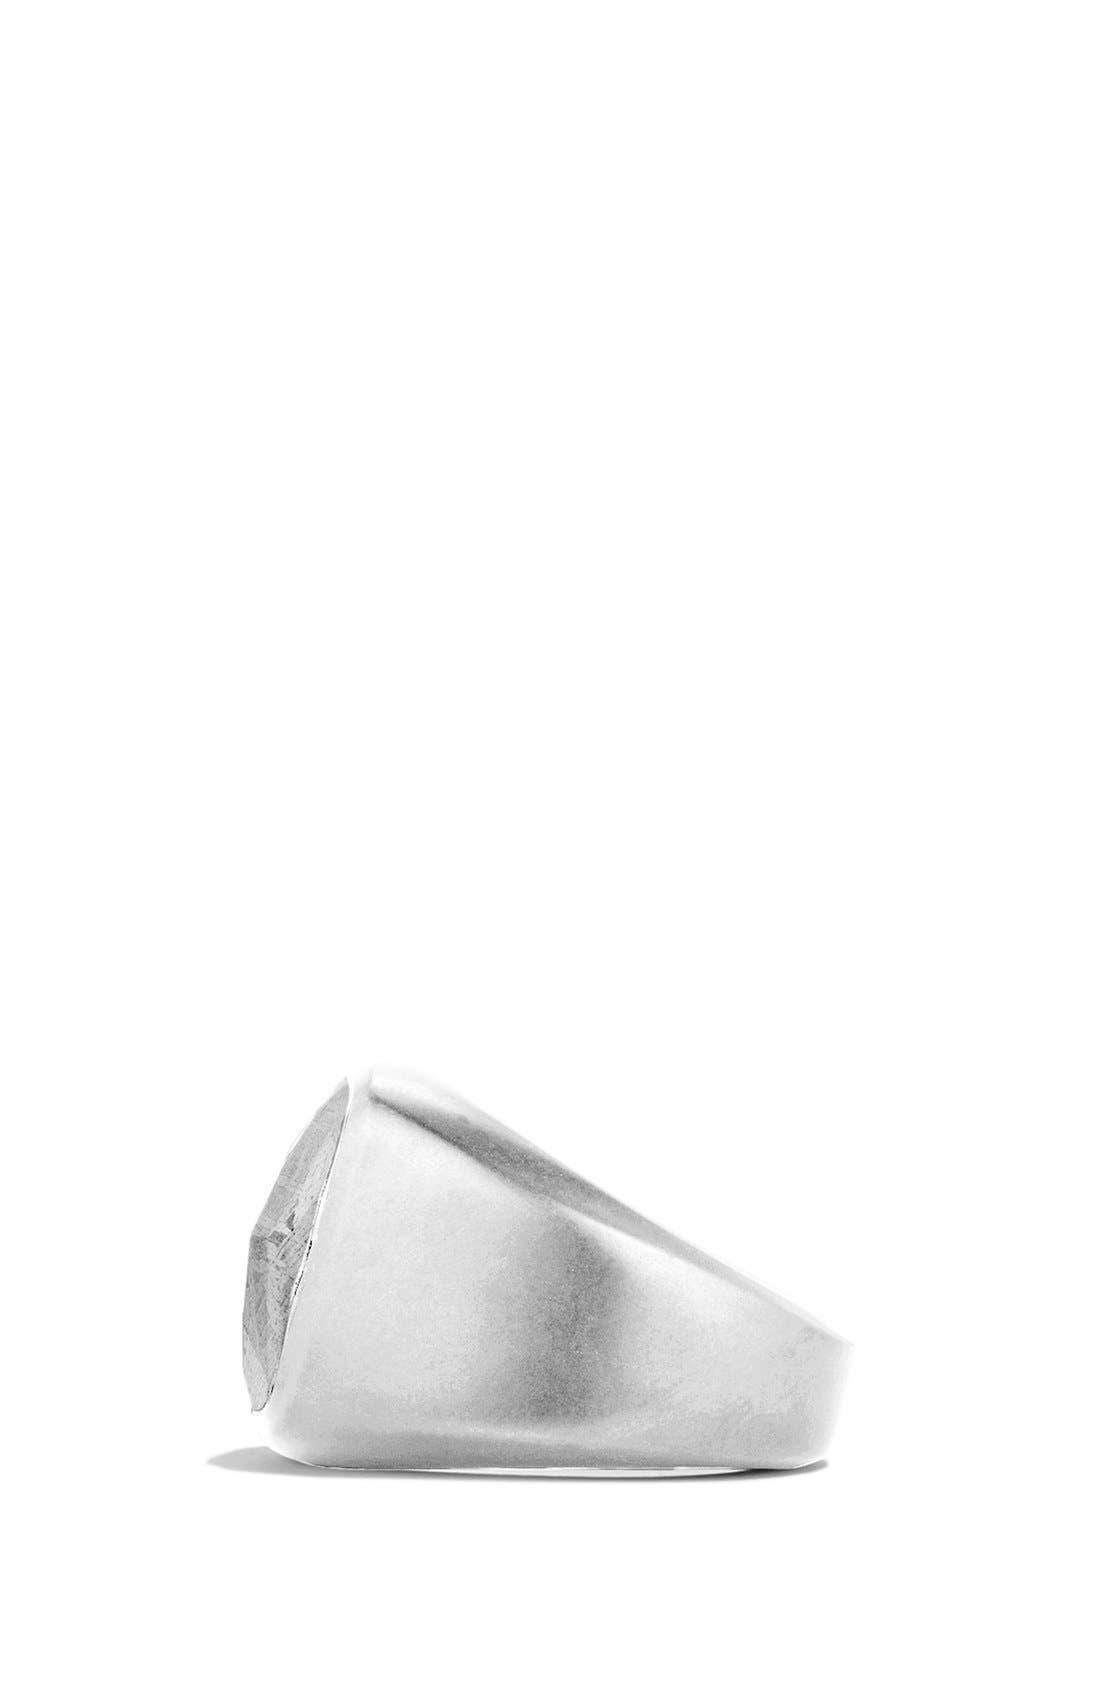 Signet Ring with Meteorite,                             Alternate thumbnail 2, color,                             Meteorite